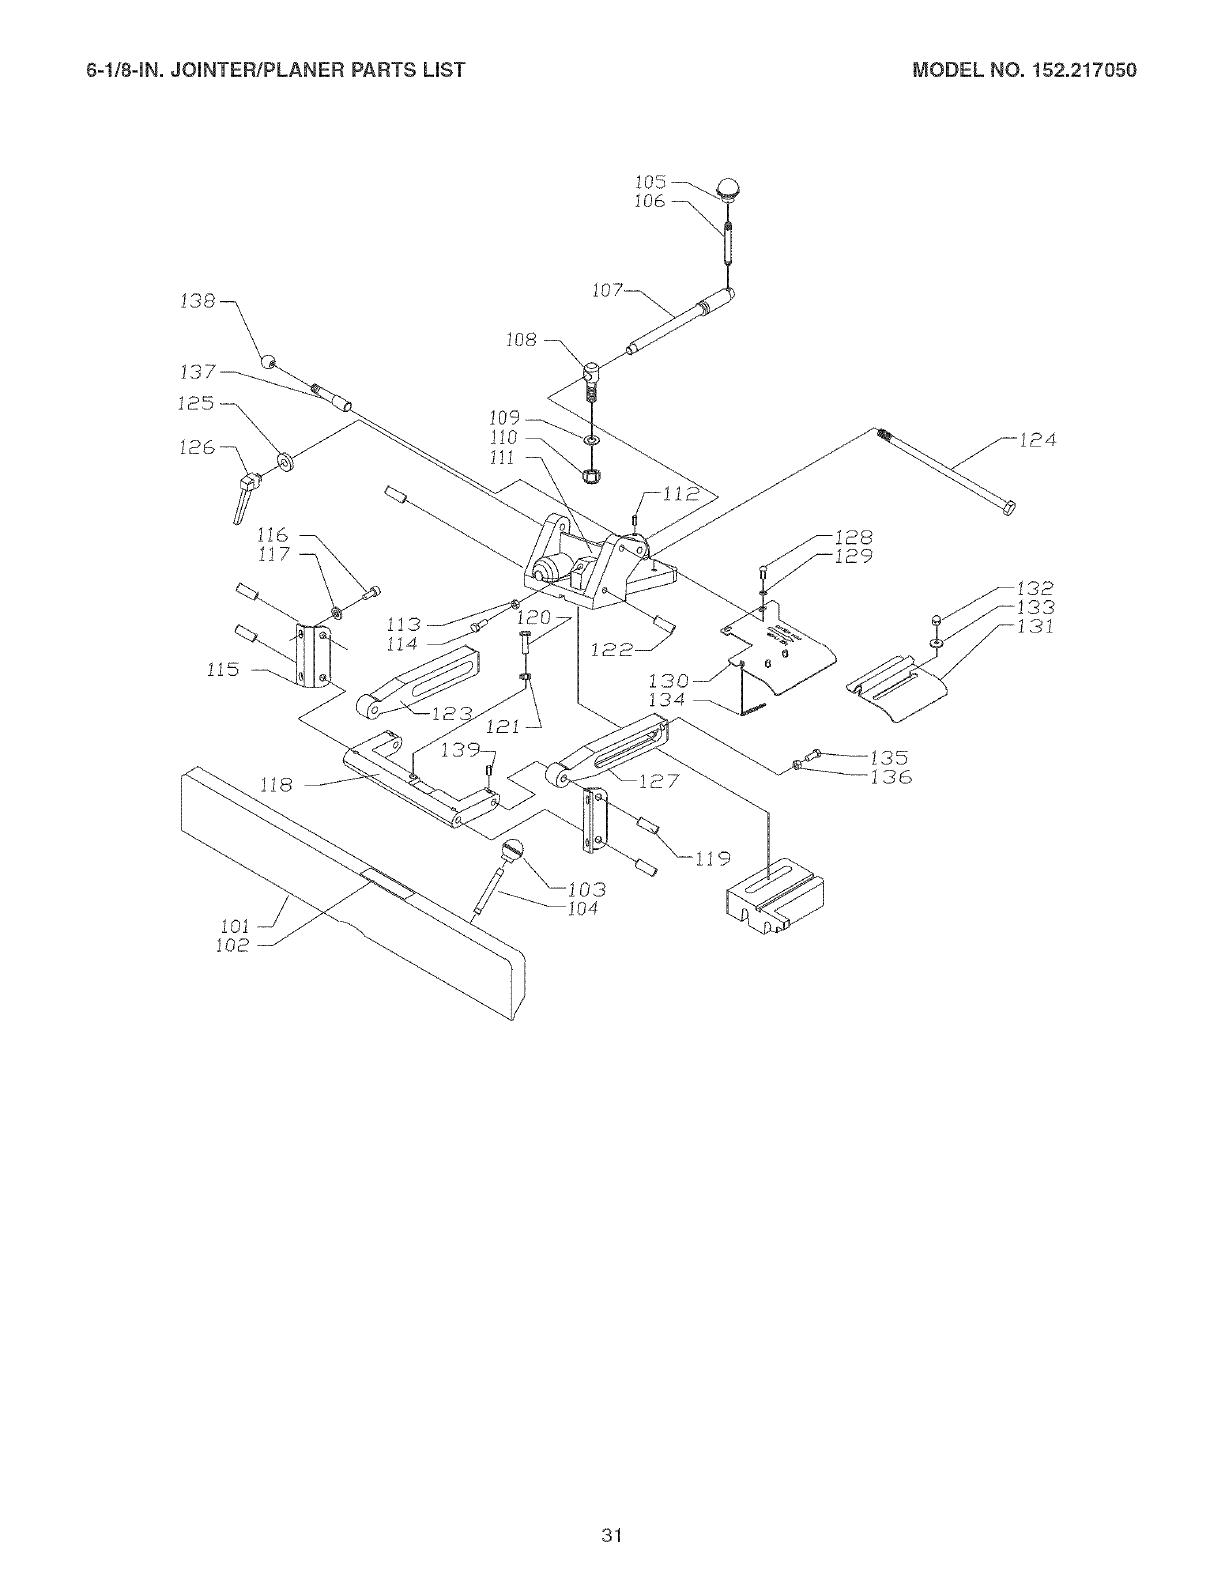 Craftsman 152217050 User Manual JOINTER/PLANER Manuals And